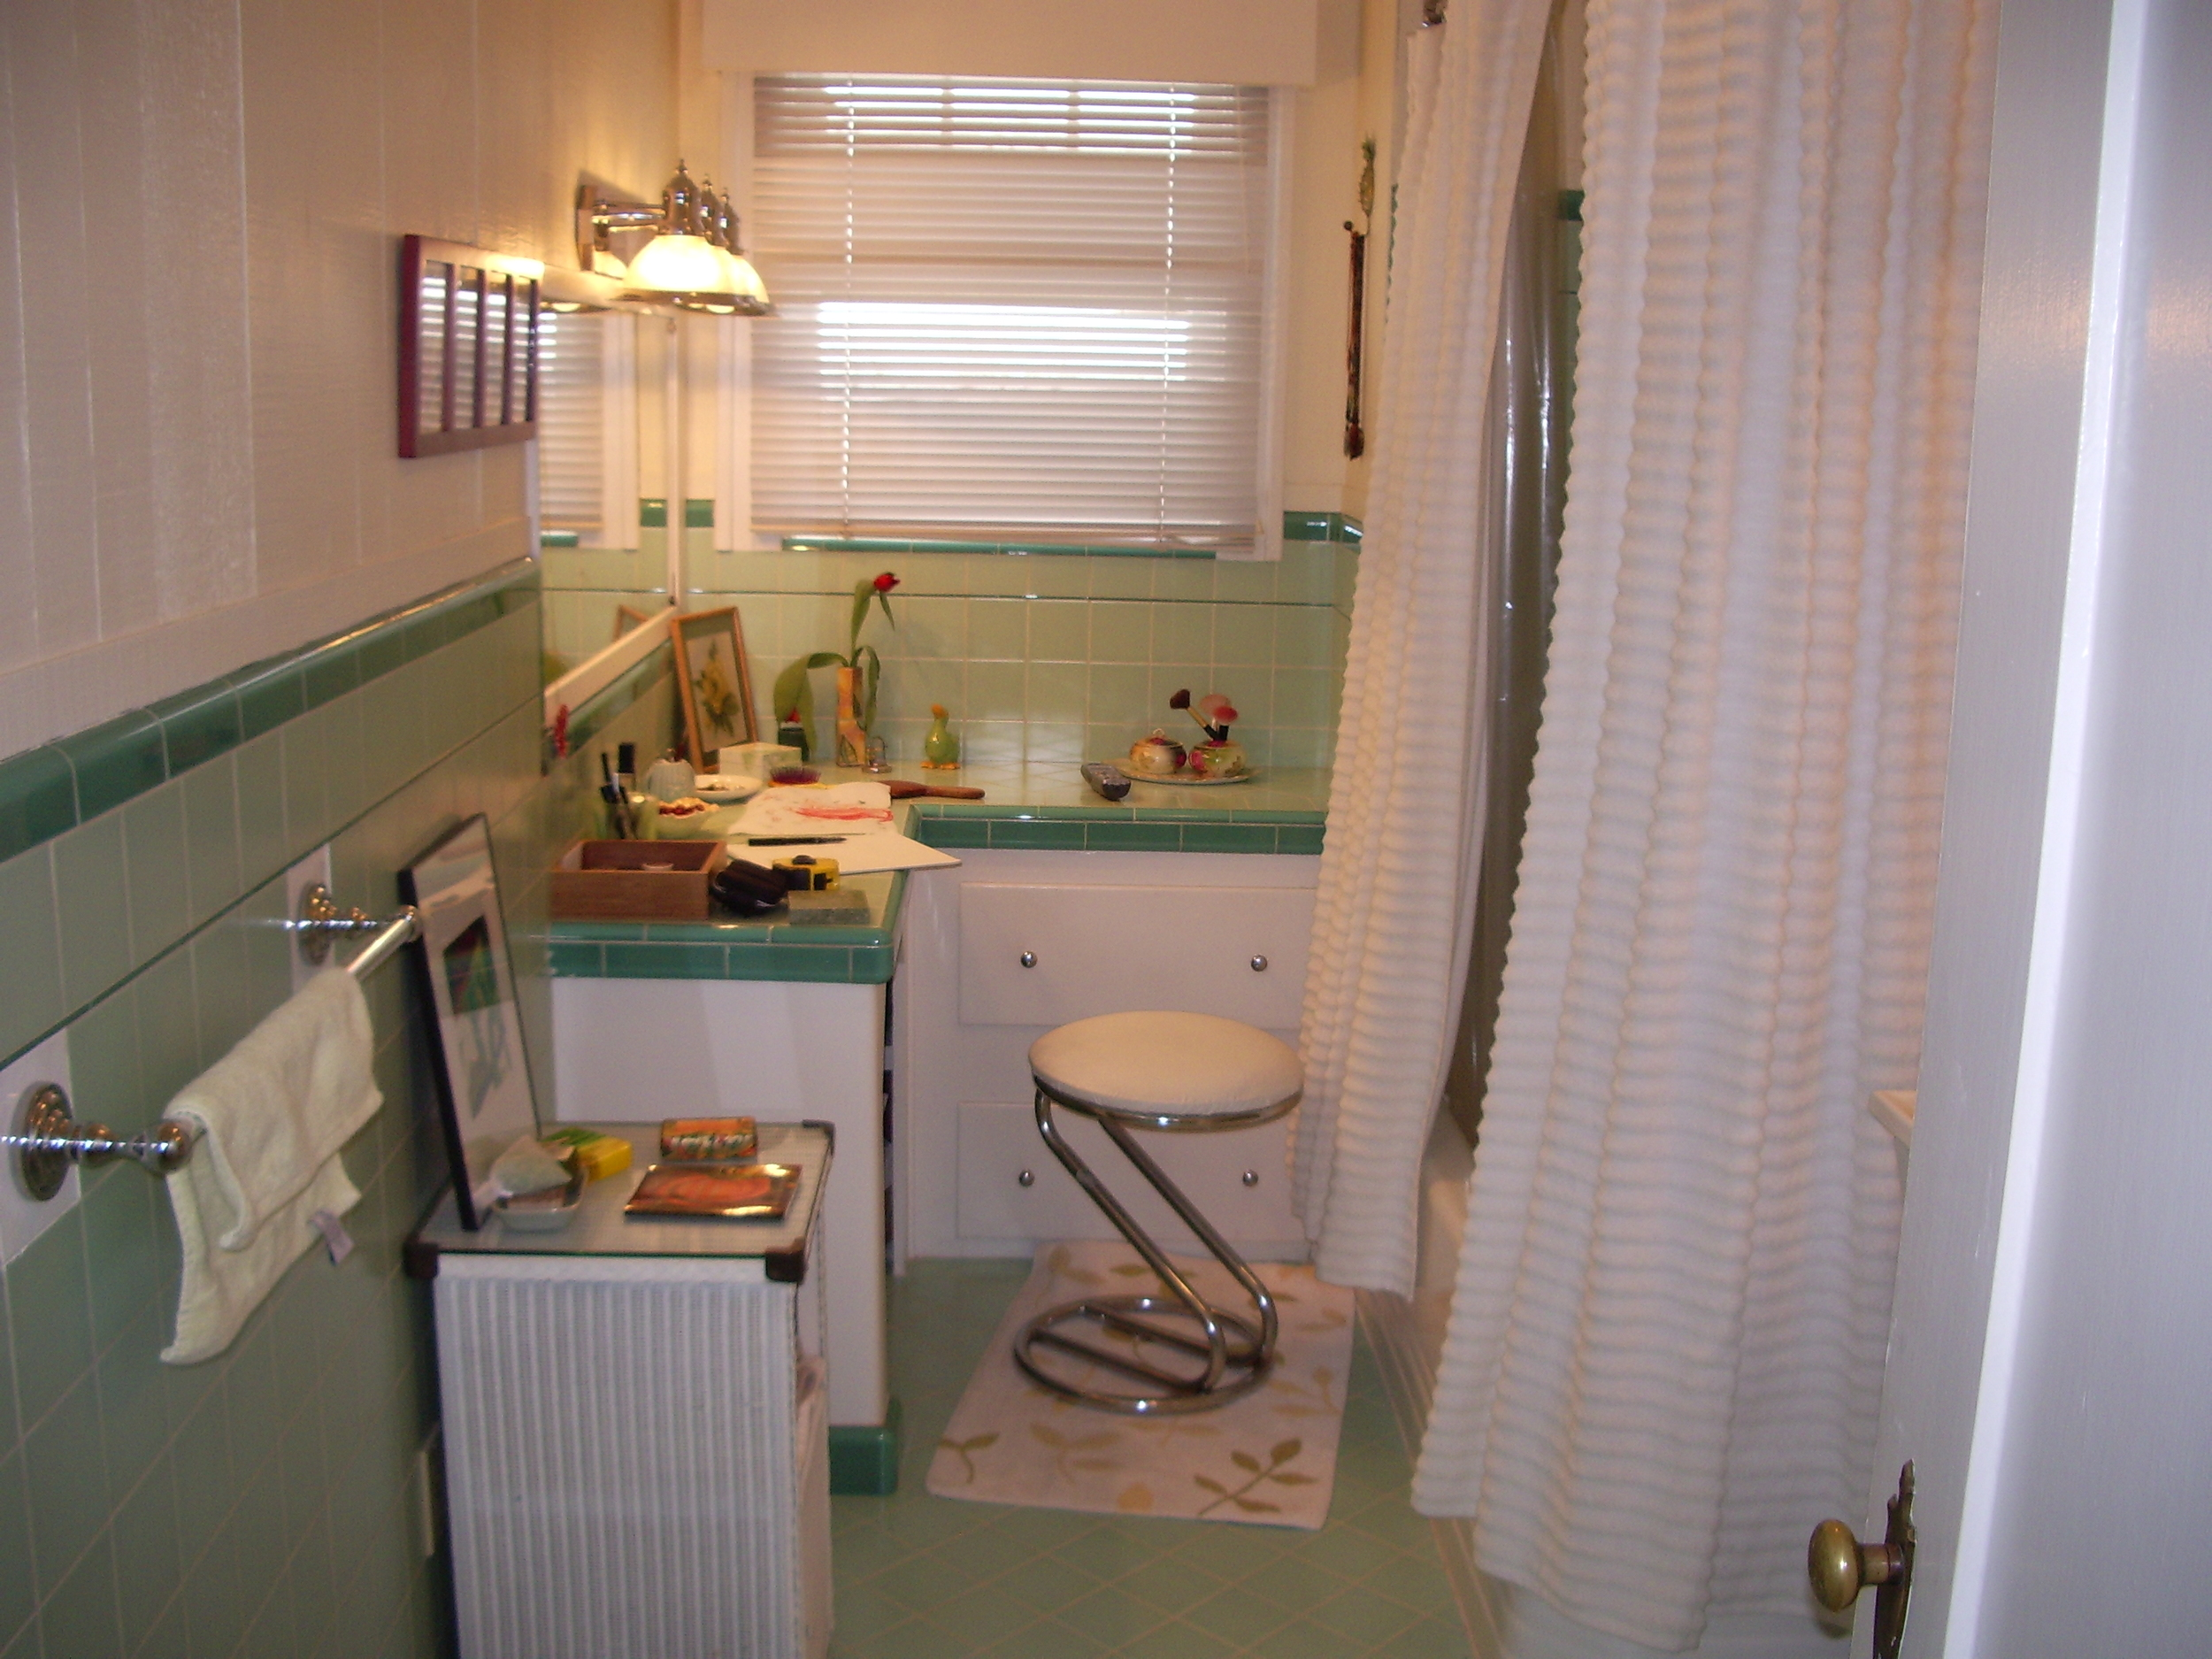 EAB Point Loma Bathroom Remodel 3.JPG